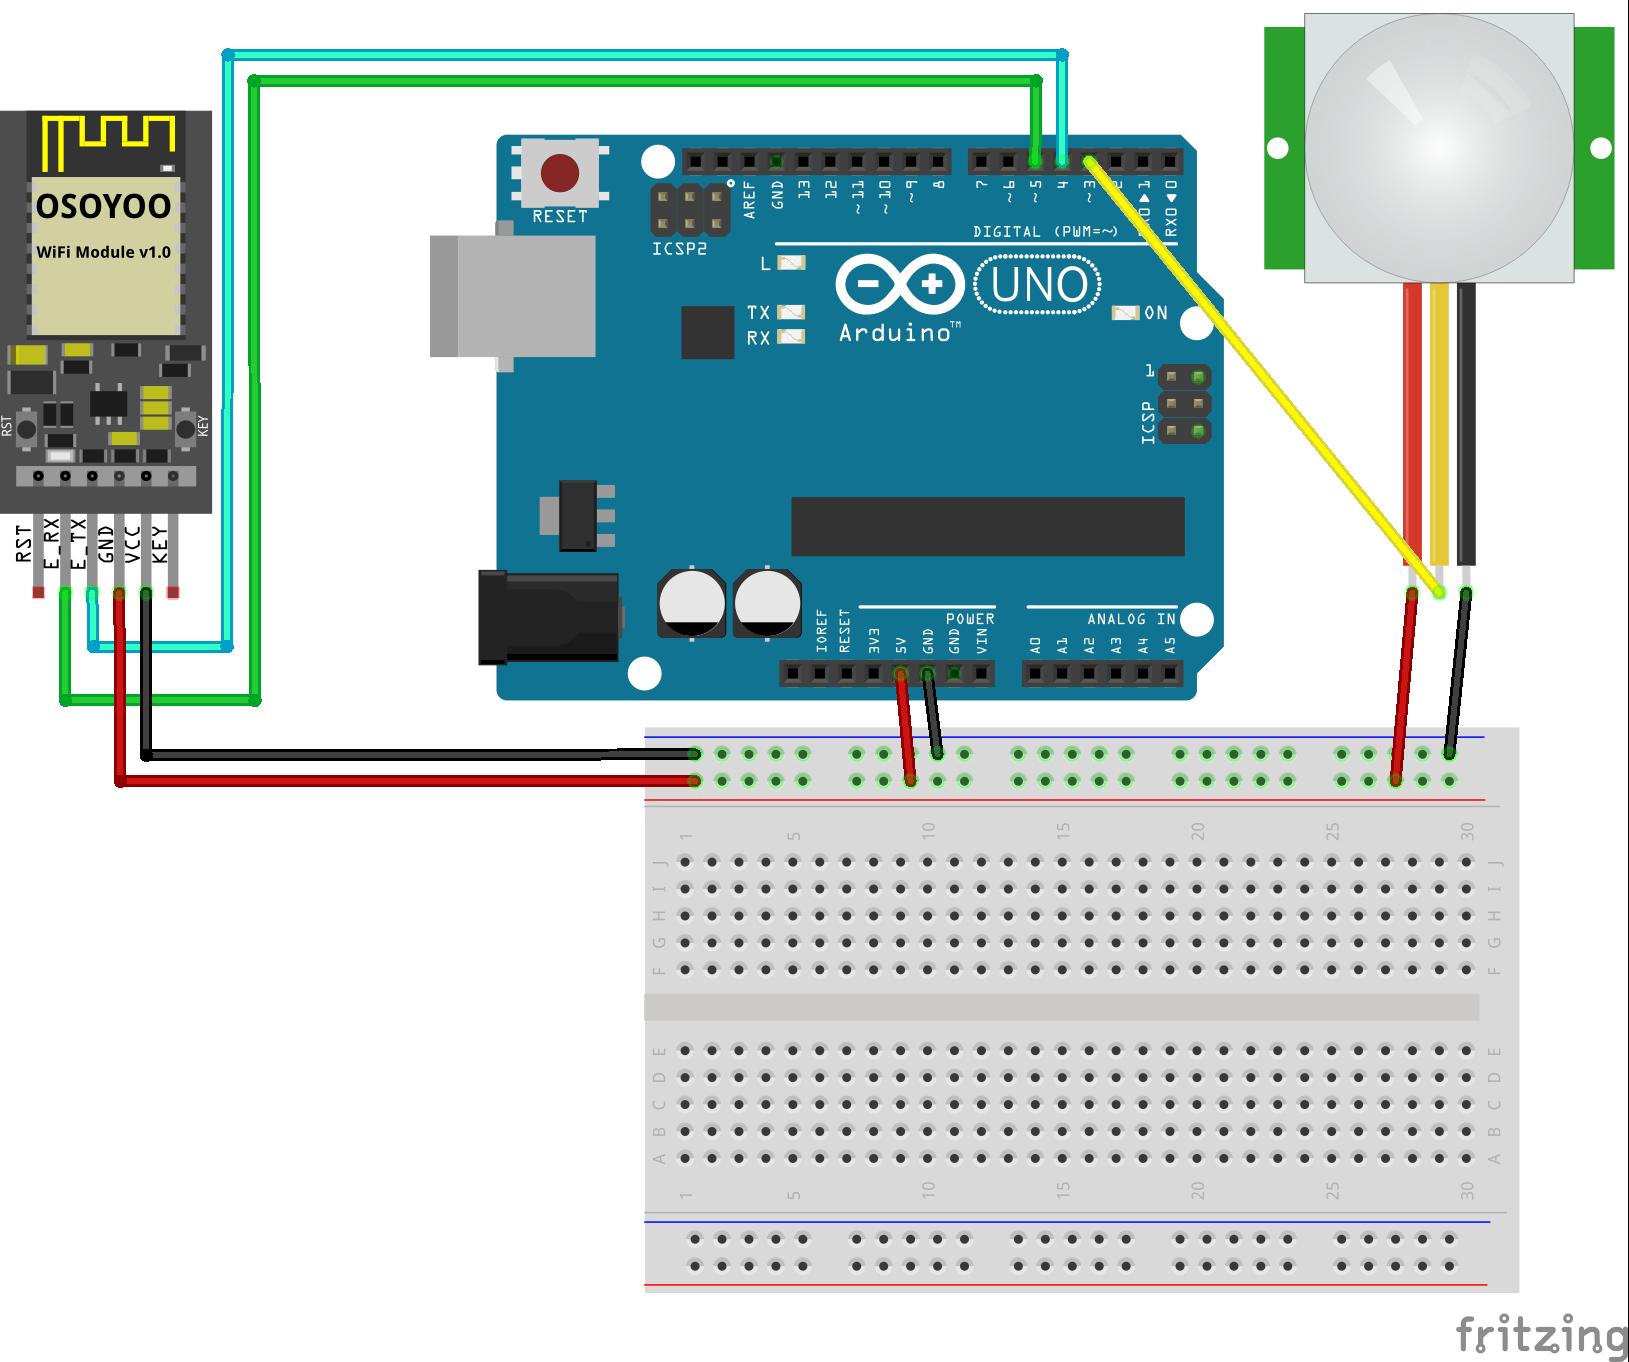 OSOYOO ESP8266 Wi-Fi Module Lesson 4: IoT Alarm System with Multiple ESP8266 modules